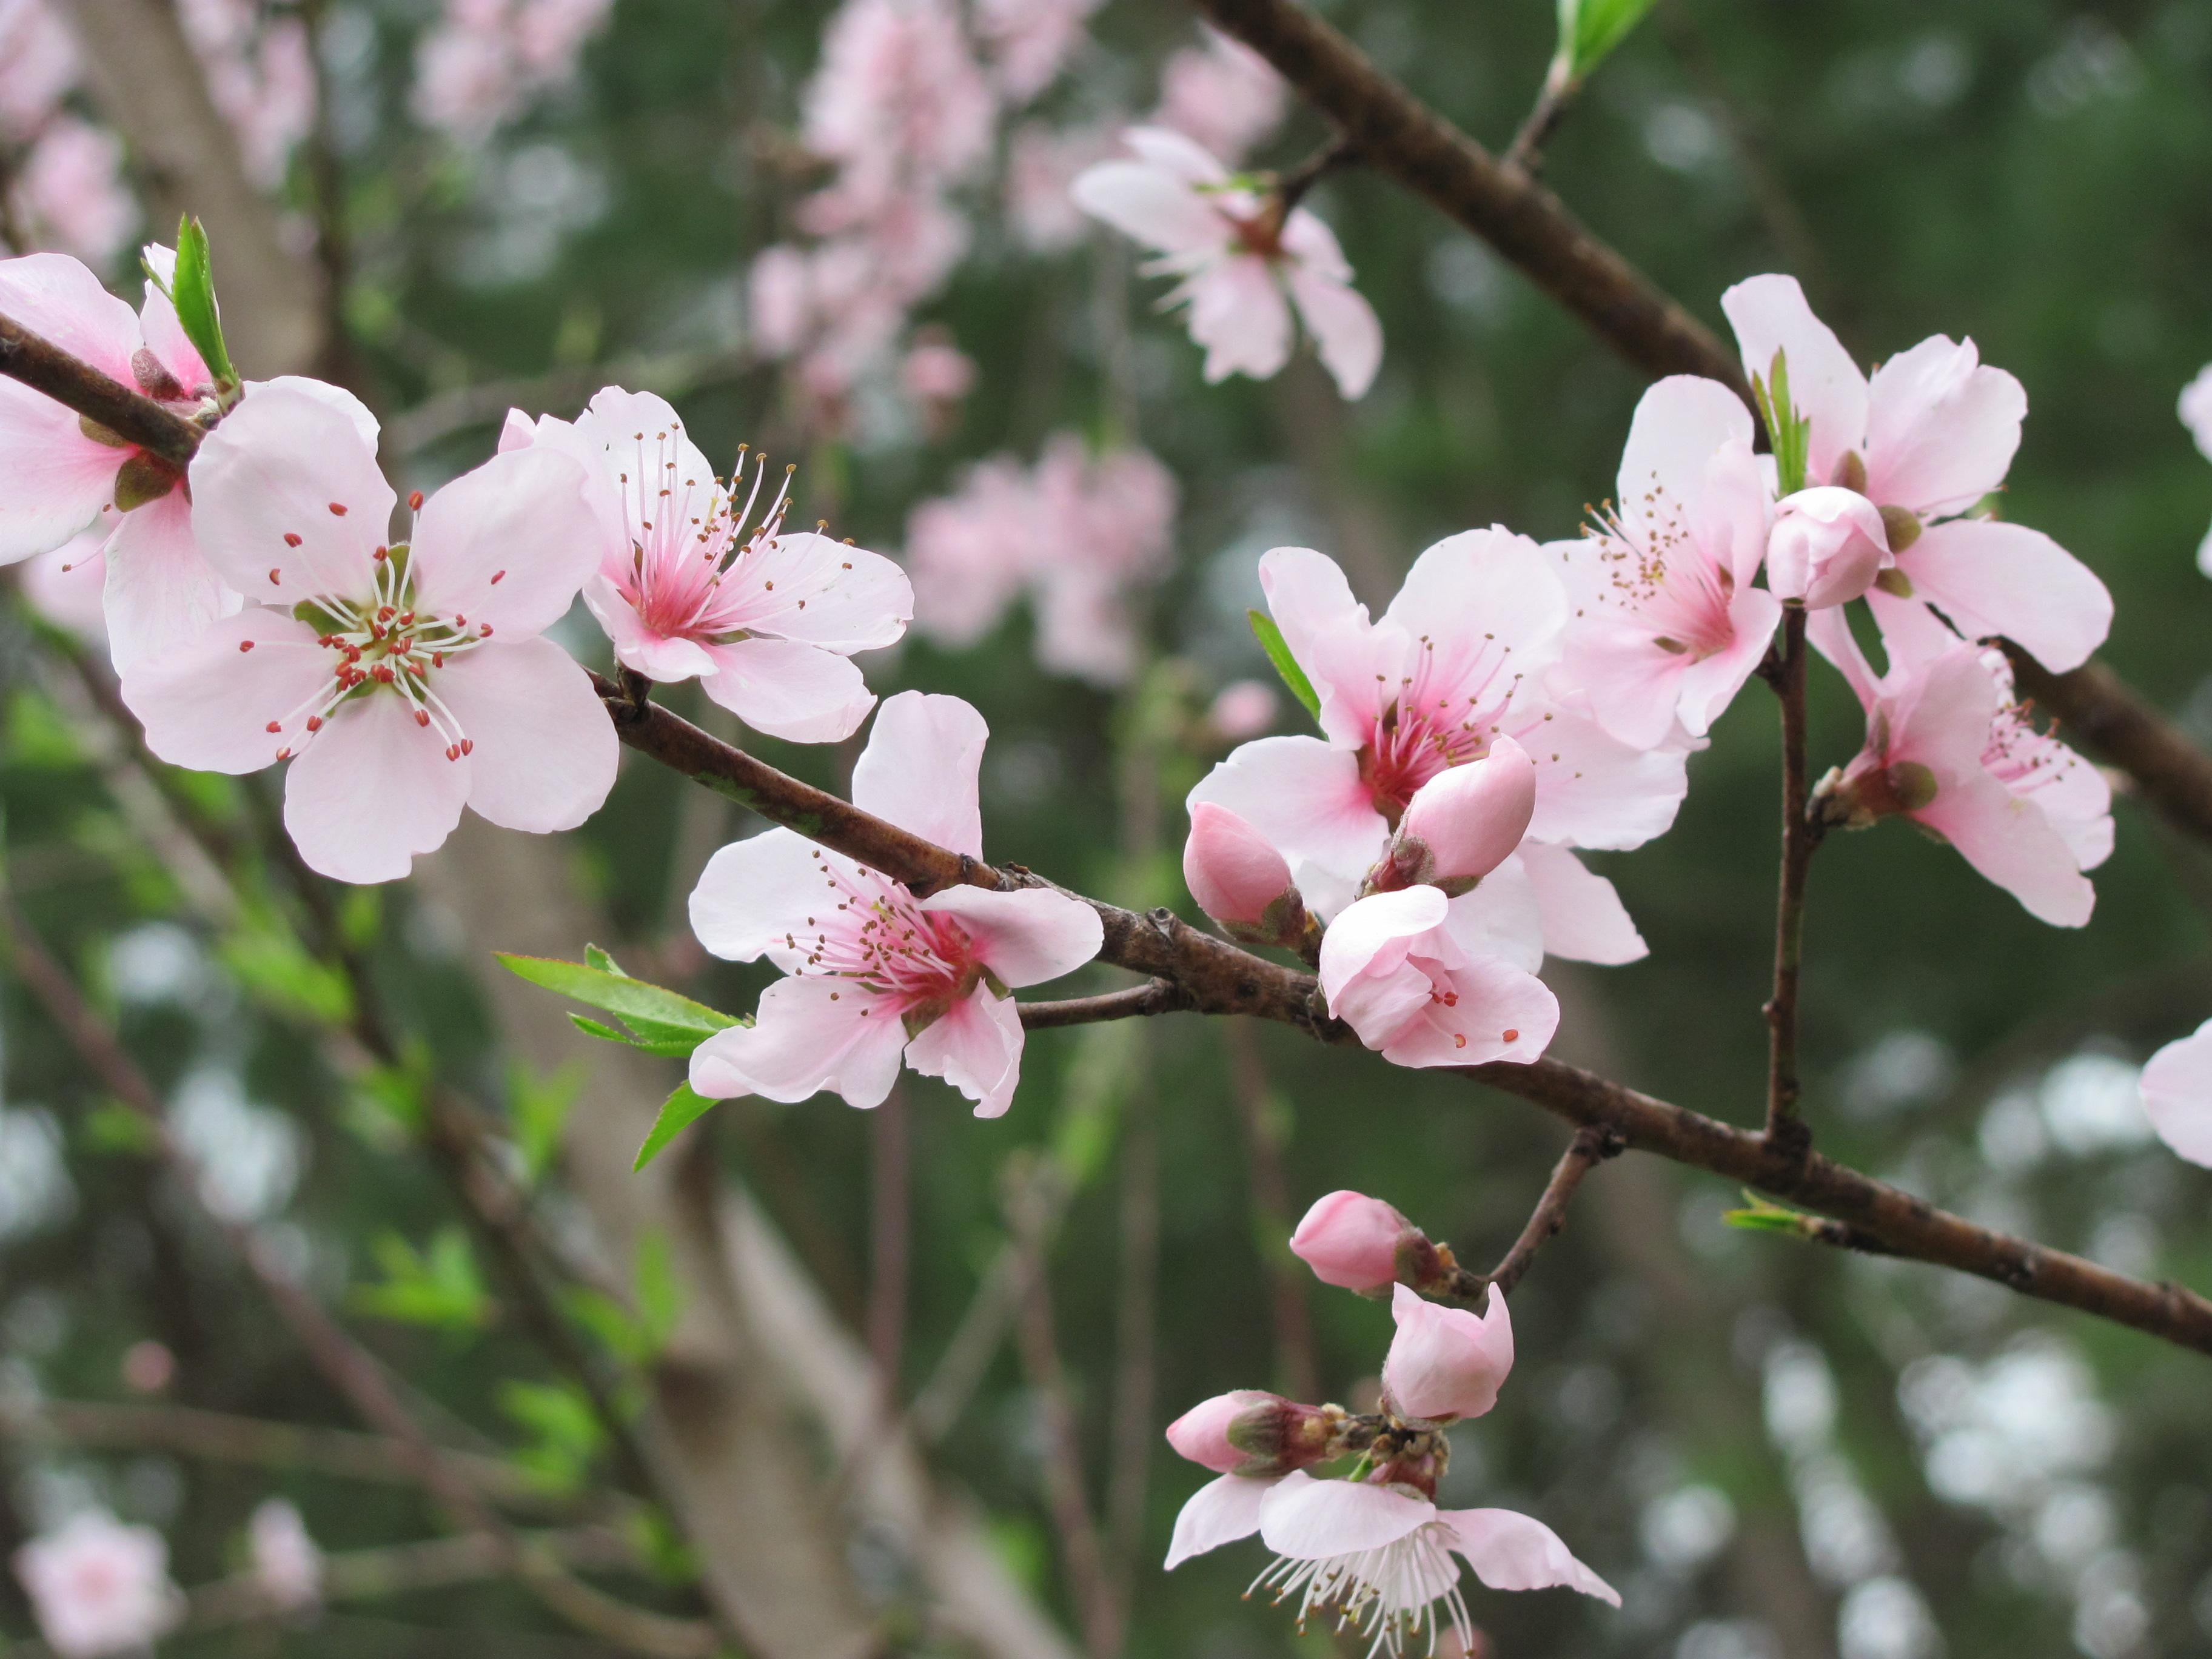 peach tree in bloom by DragonladysLair on DeviantArt